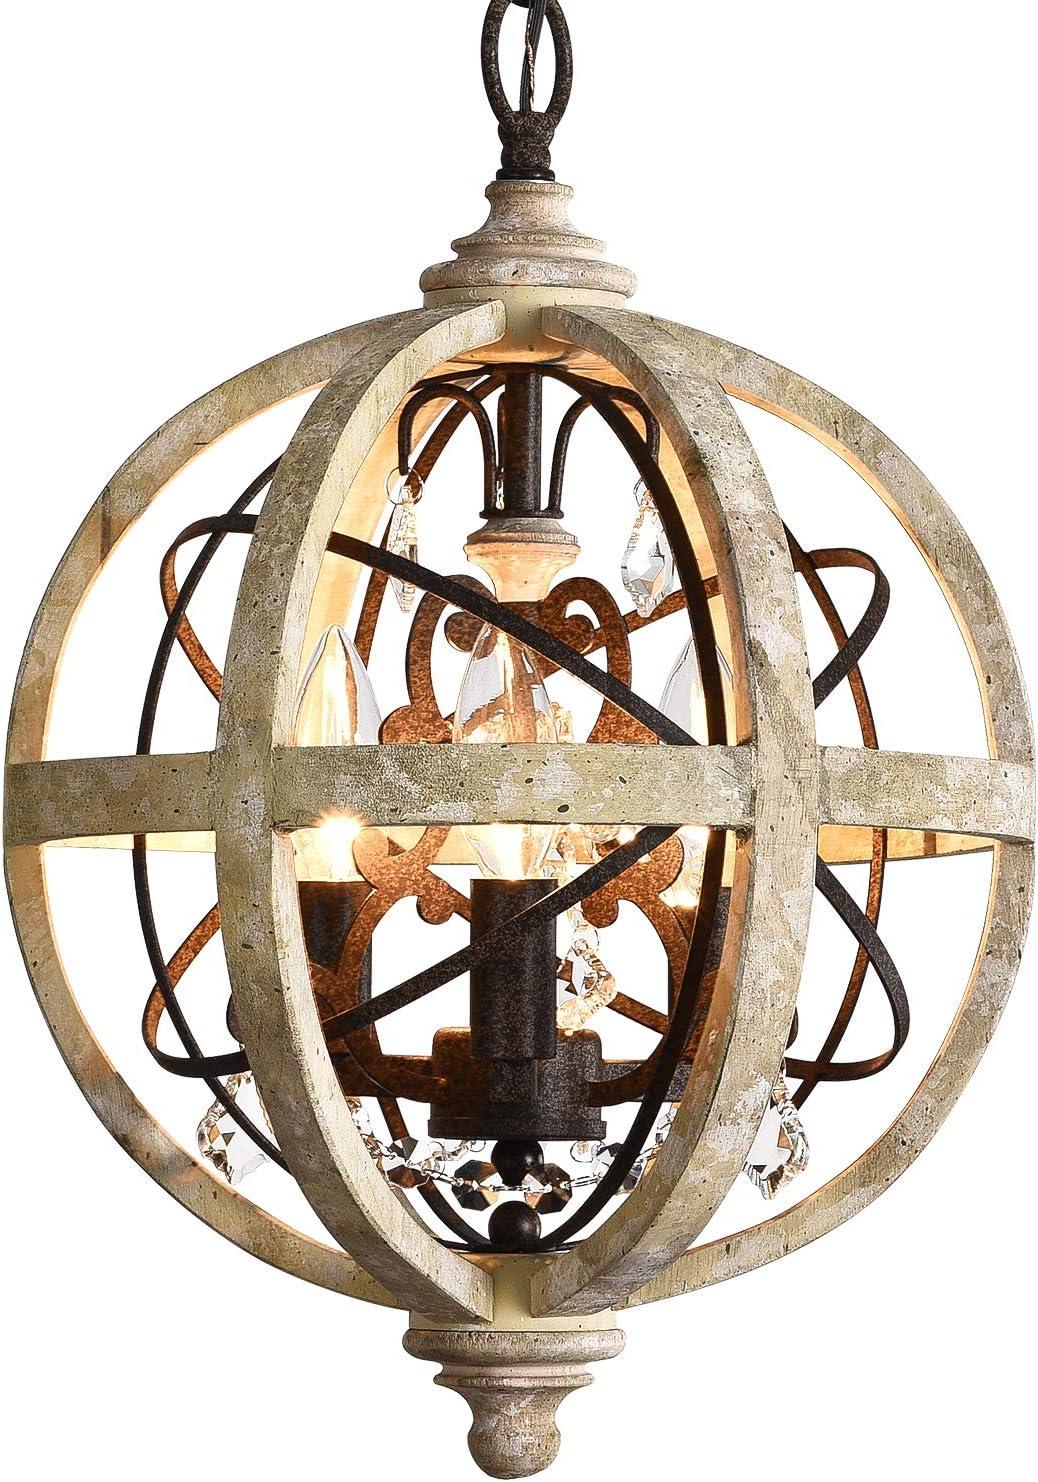 PAFEE 3-Light Wooden Chandelier Rustic Vintage Weathered Wooden Globe Metal Orbed Crystal Chandelier Ceiling Light